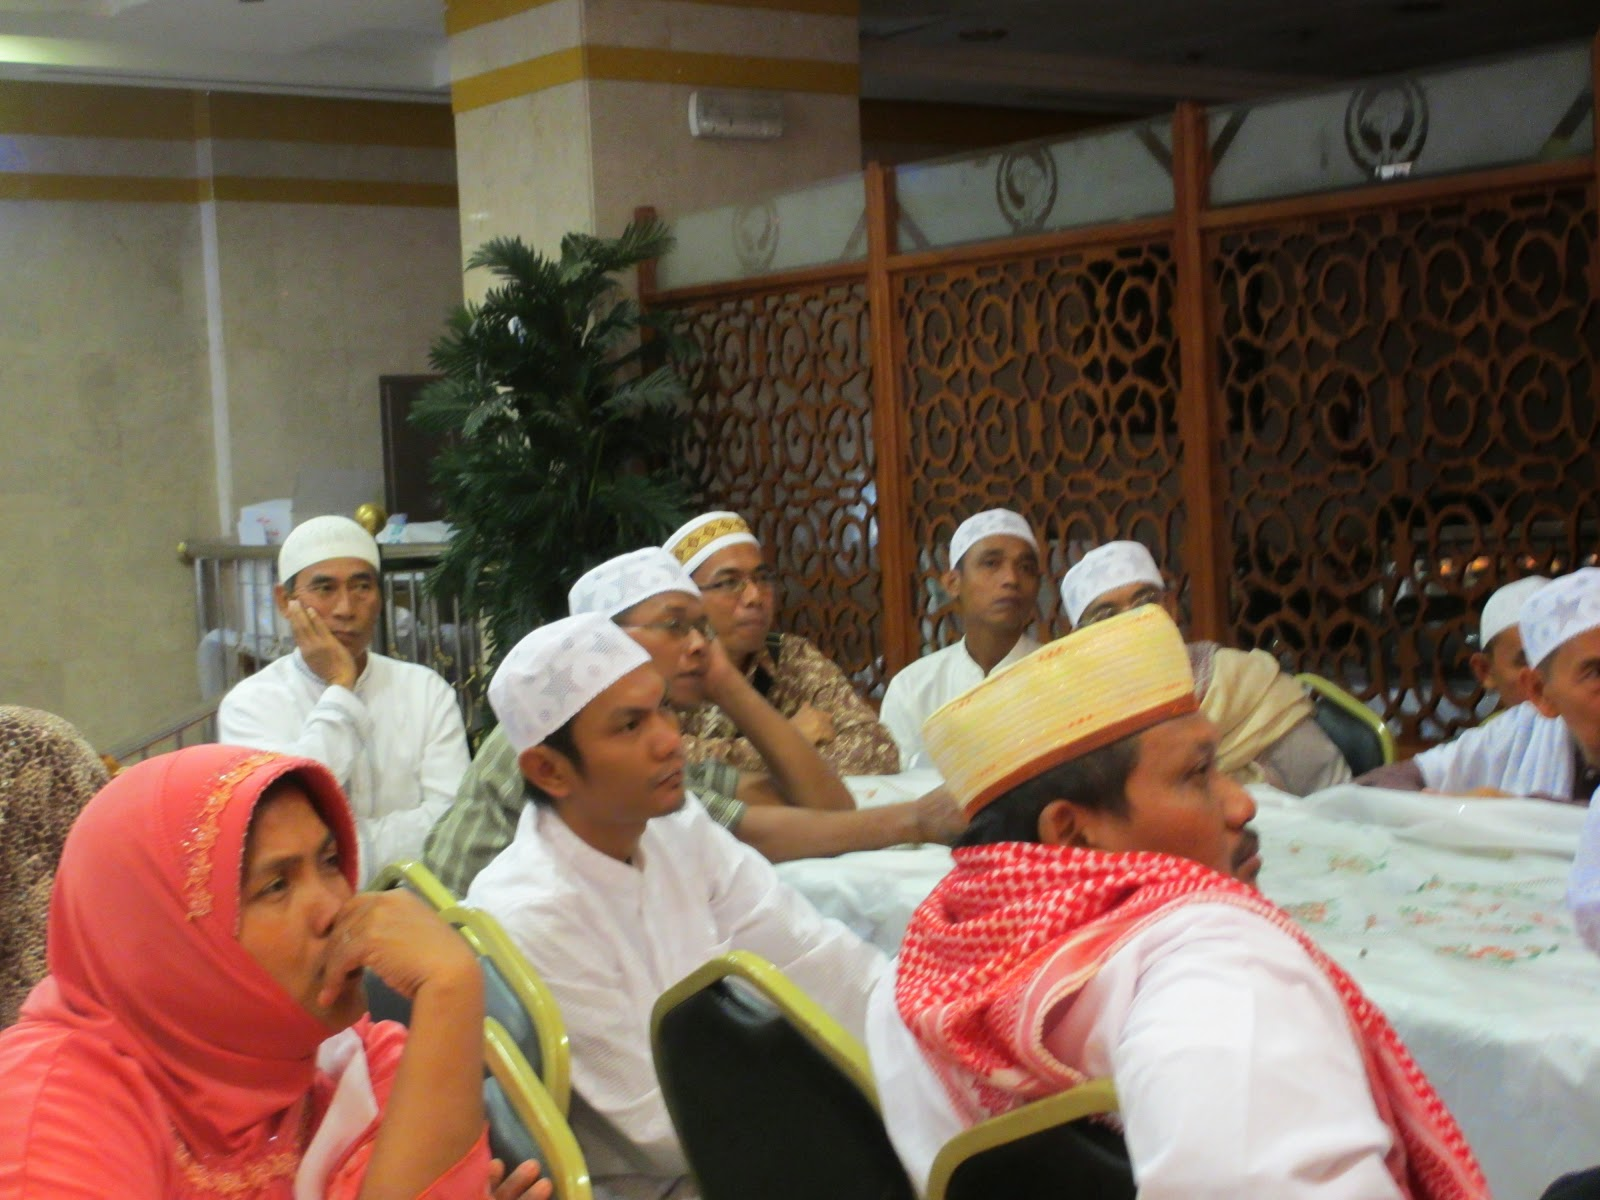 Harga Paket Umroh Desember 2014 Surabaya Aman Nyaman dan Terpercaya